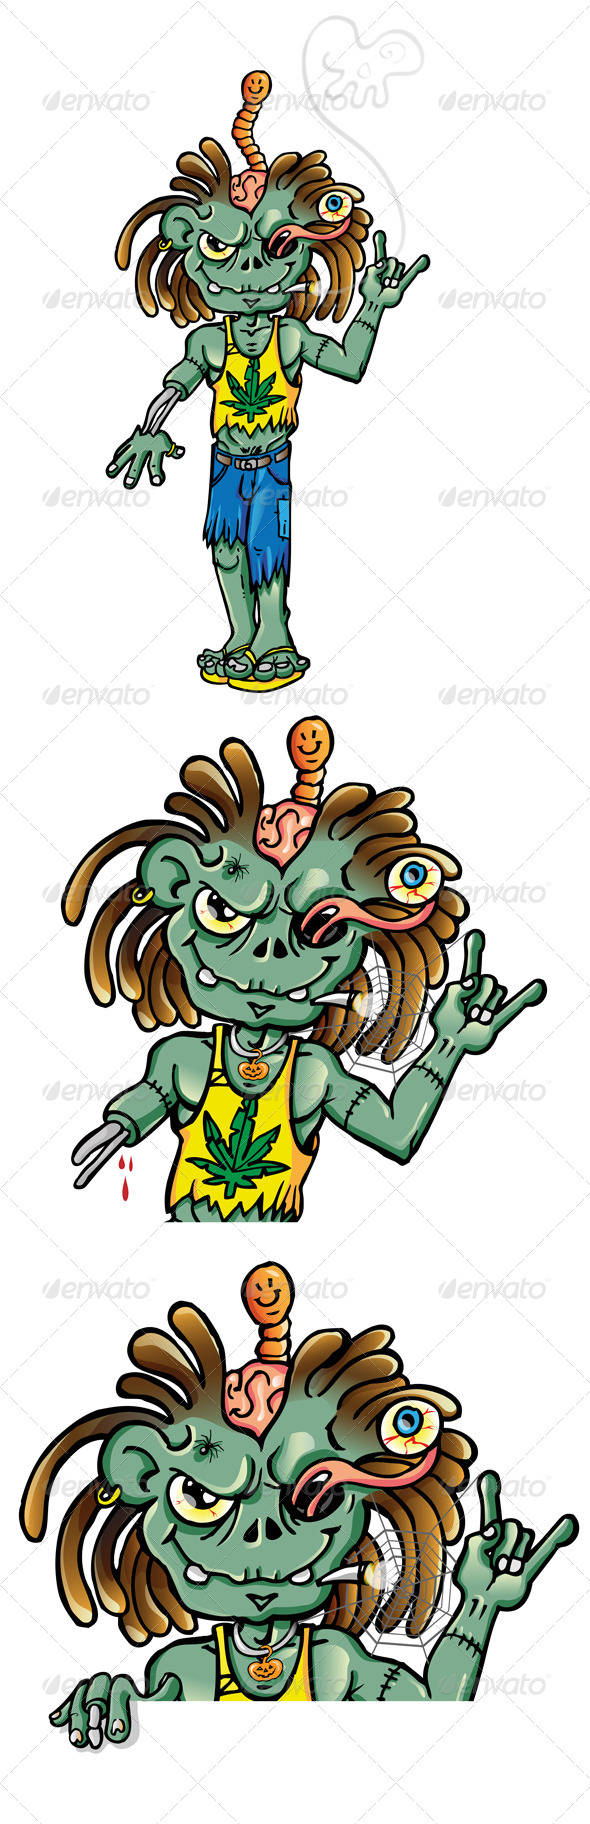 GraphicRiver Jamaican Zombie 7741526